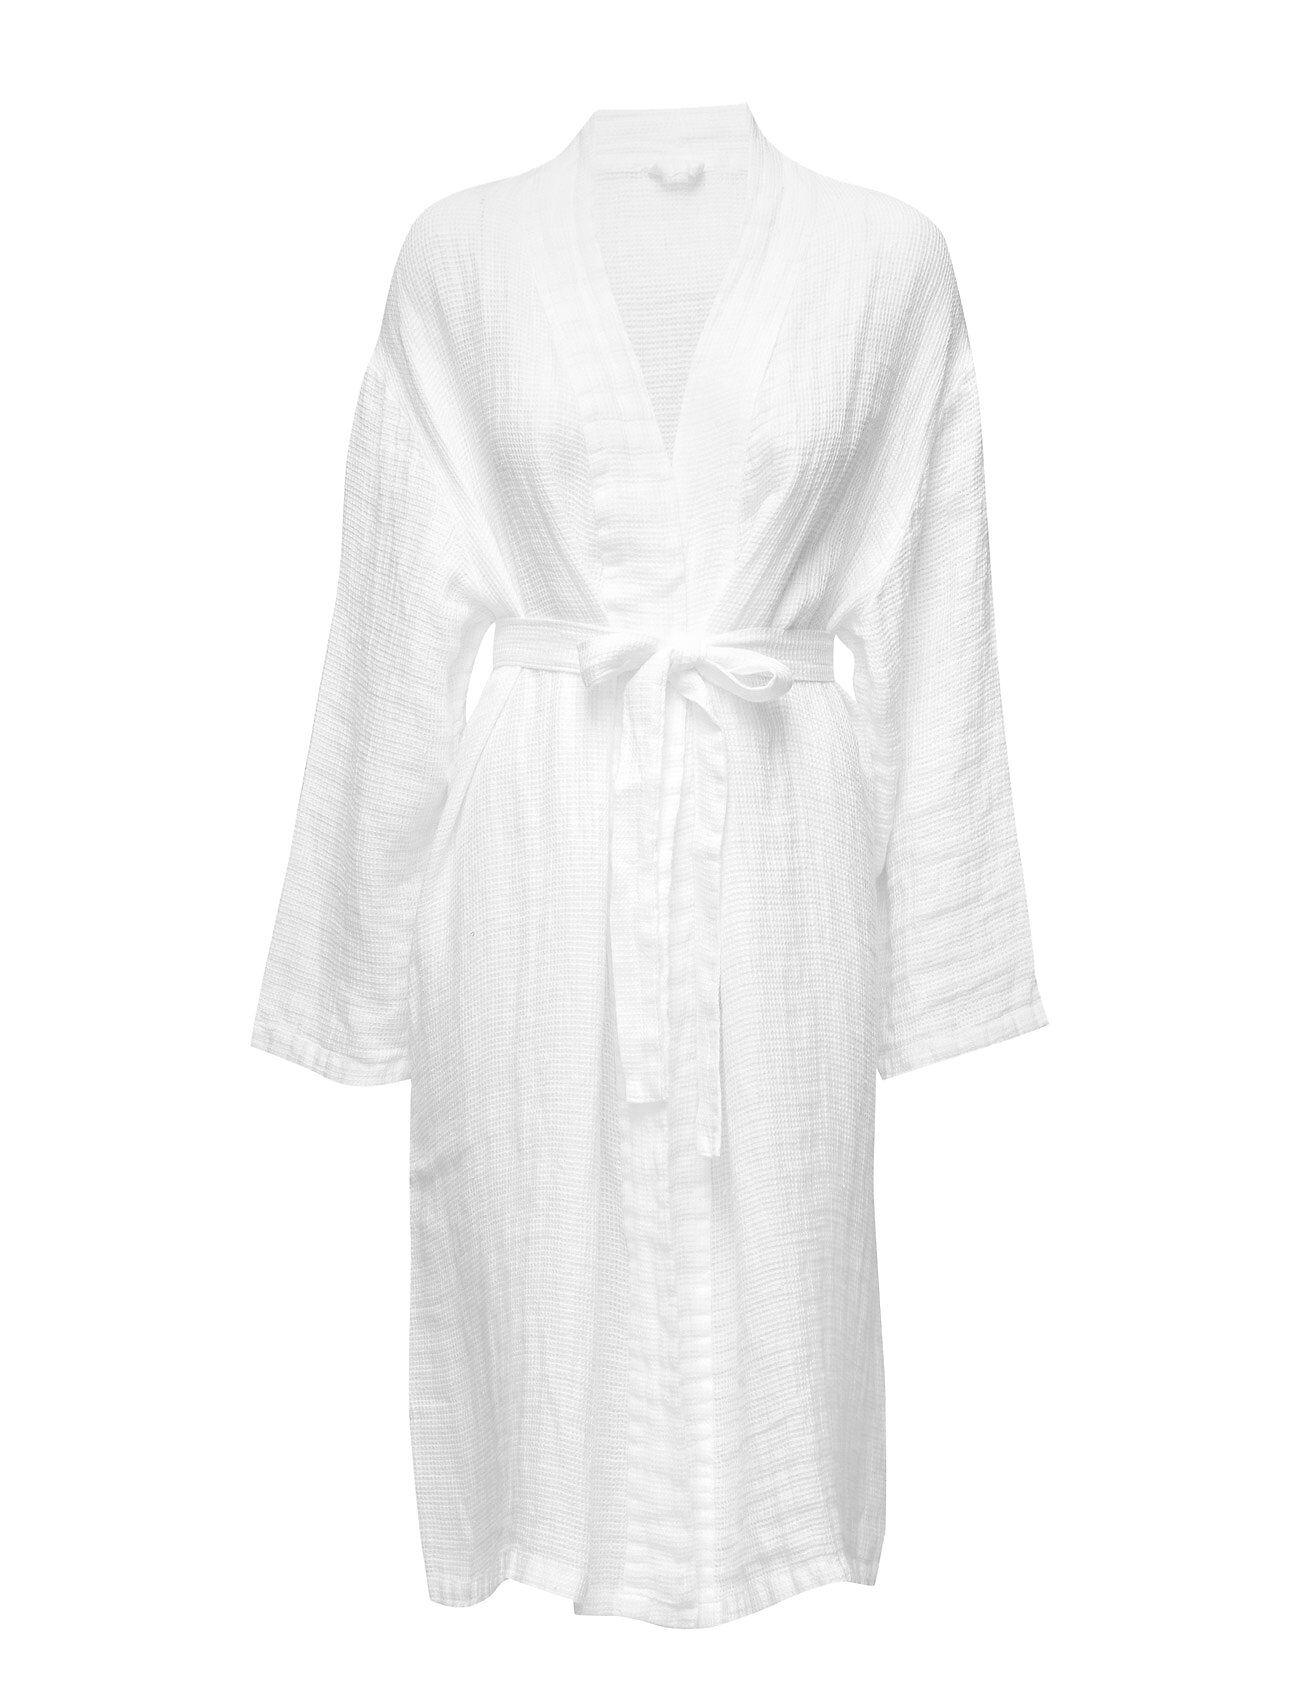 Himla Fresh Laundry Kimono Lingerie Bathroom Robes Valkoinen Himla